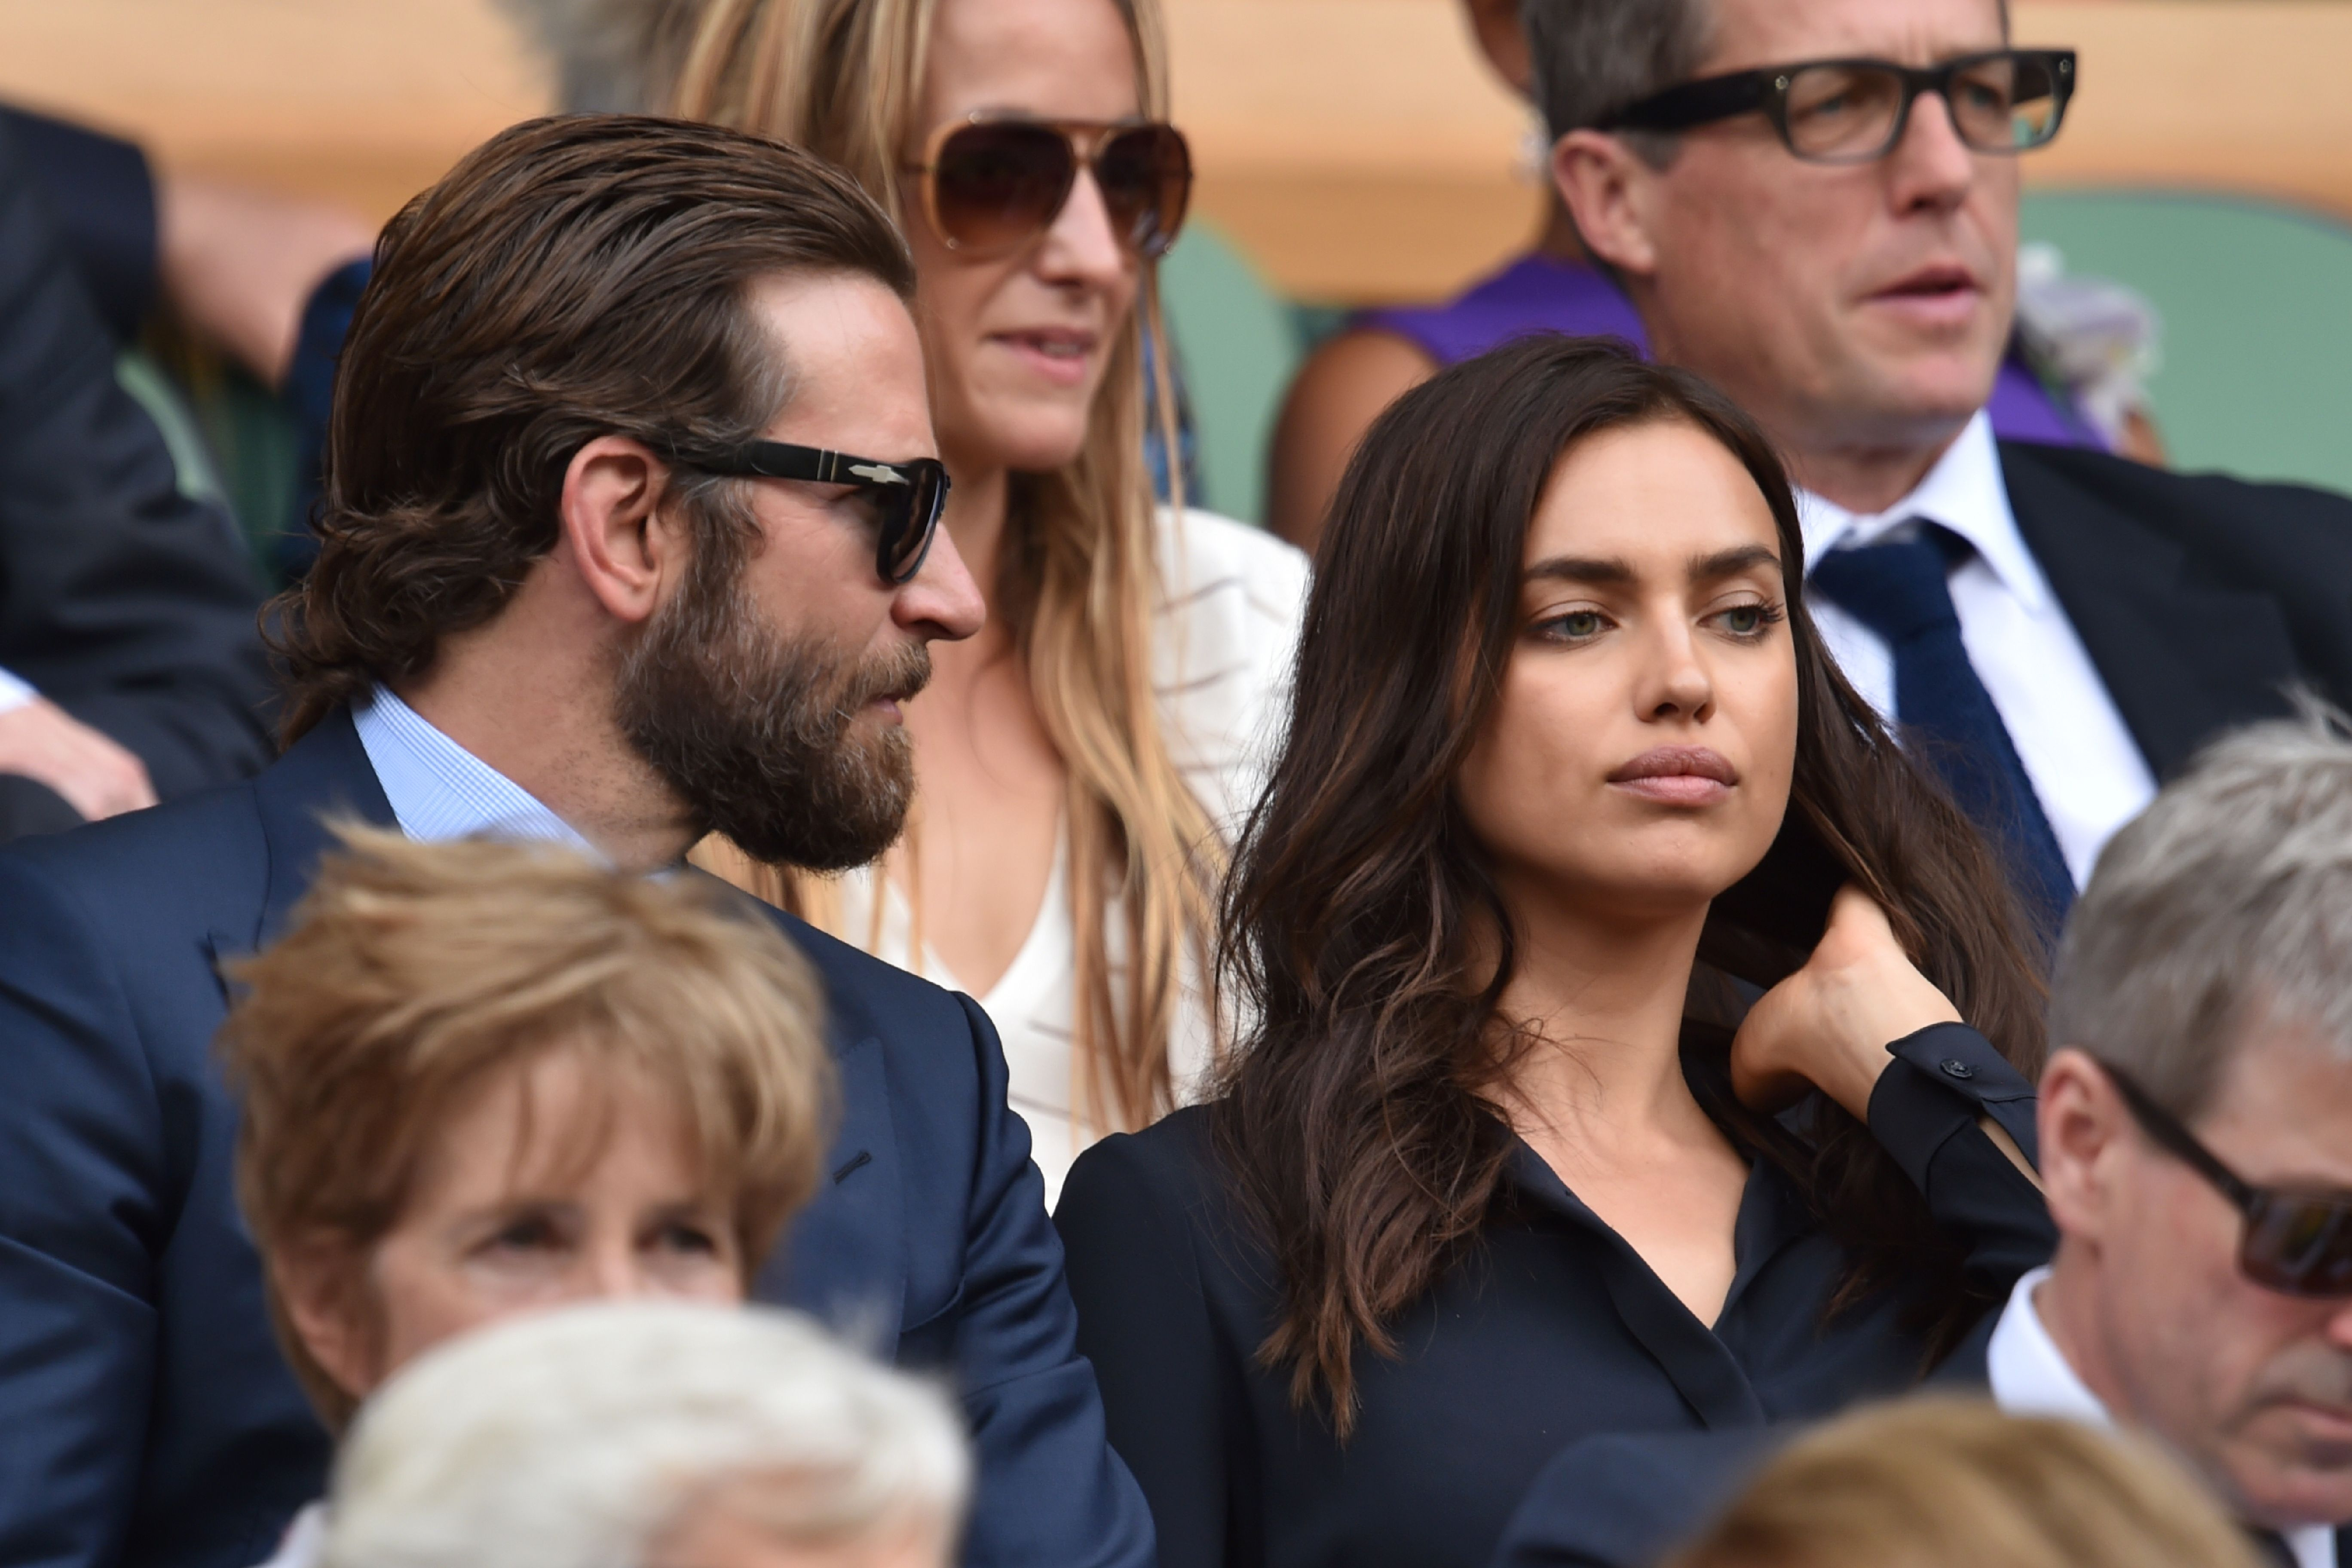 Things seemed tense between Bradley Cooper and Irina Shayk ((Picture: AFP/Getty)